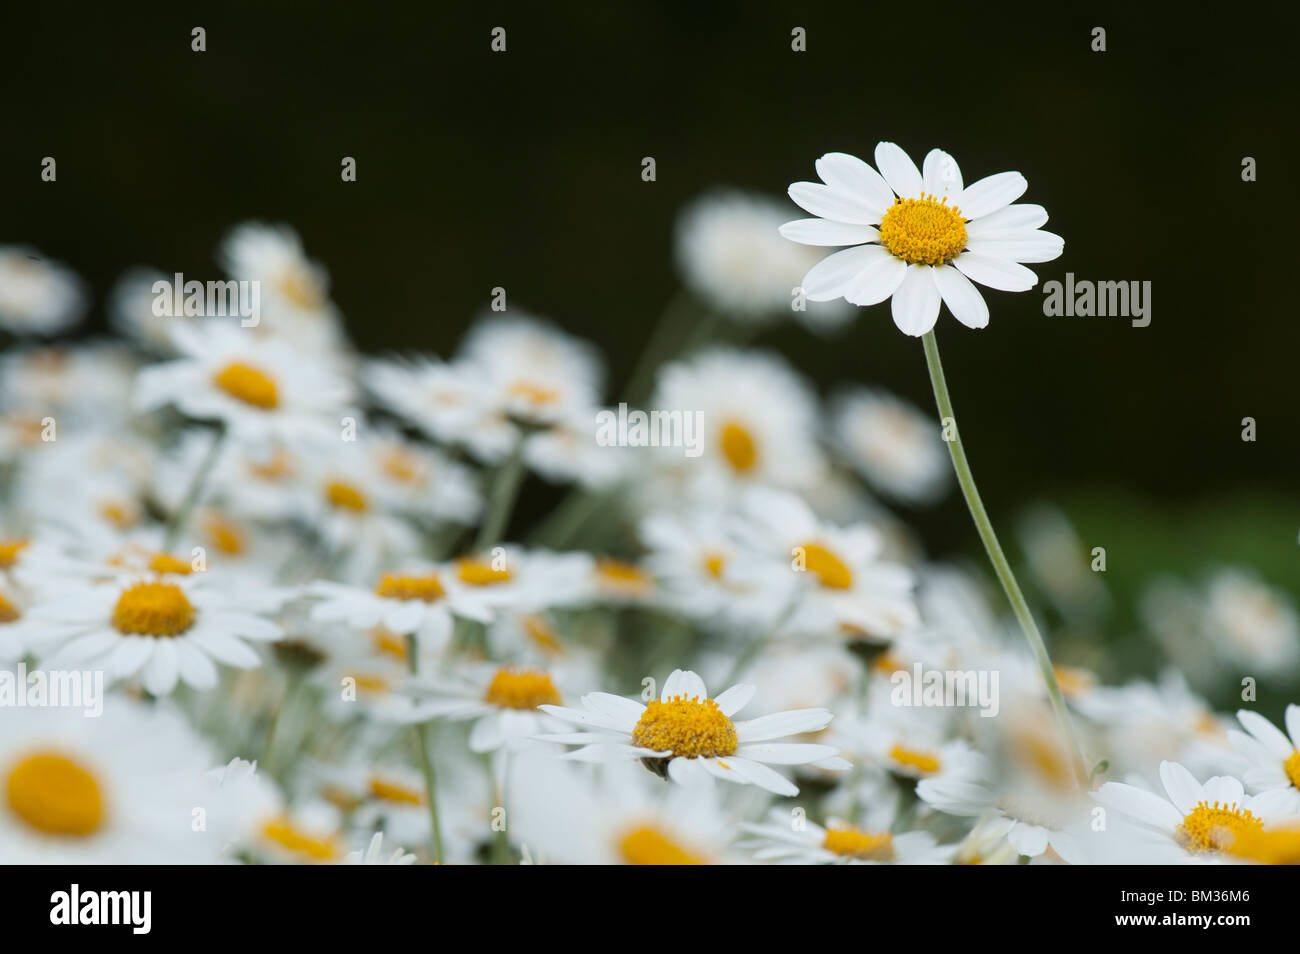 Anthemis Punctata Cupaniana, Sicilian chamomile flowers - Stock Image